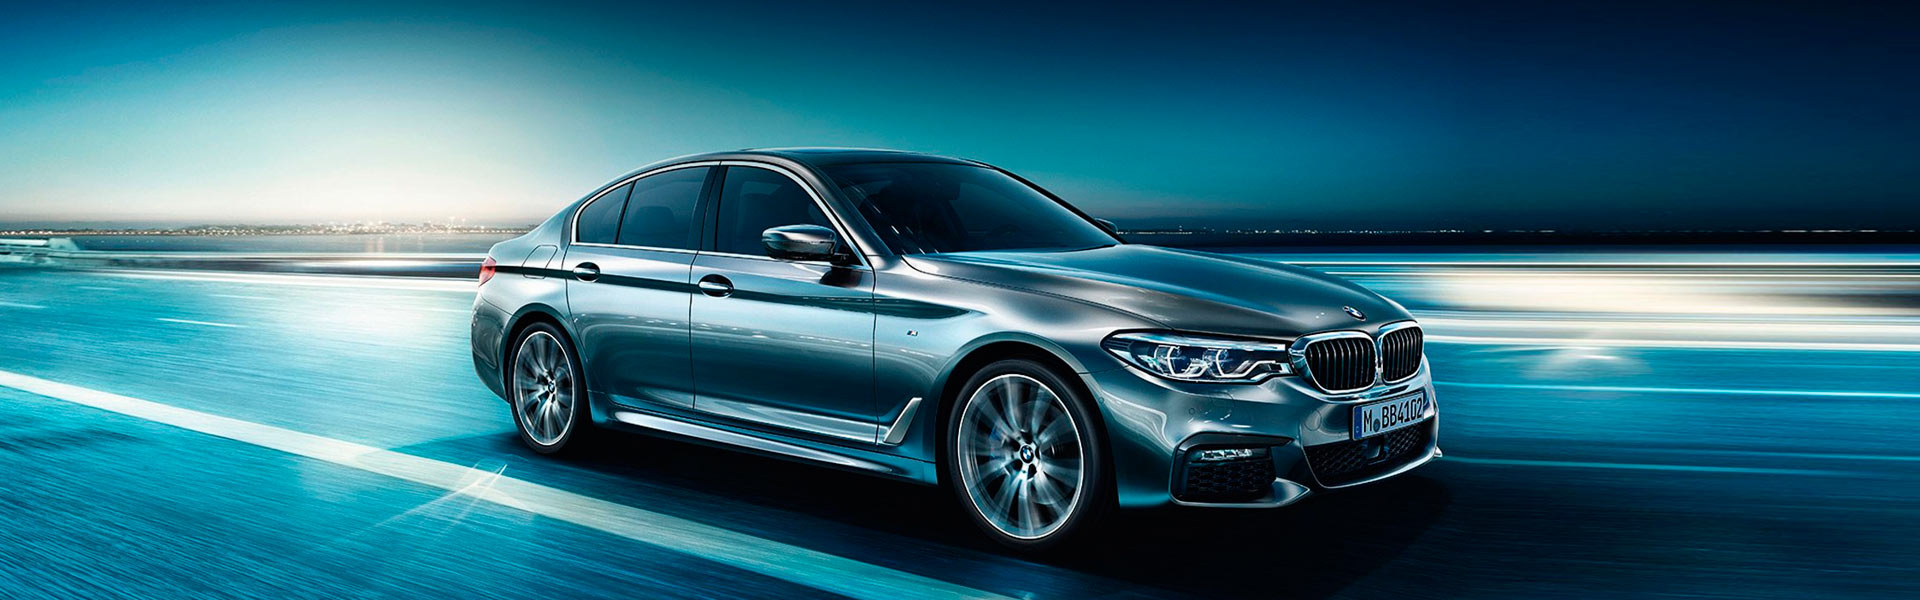 Ремонт электрики BMW 5-series